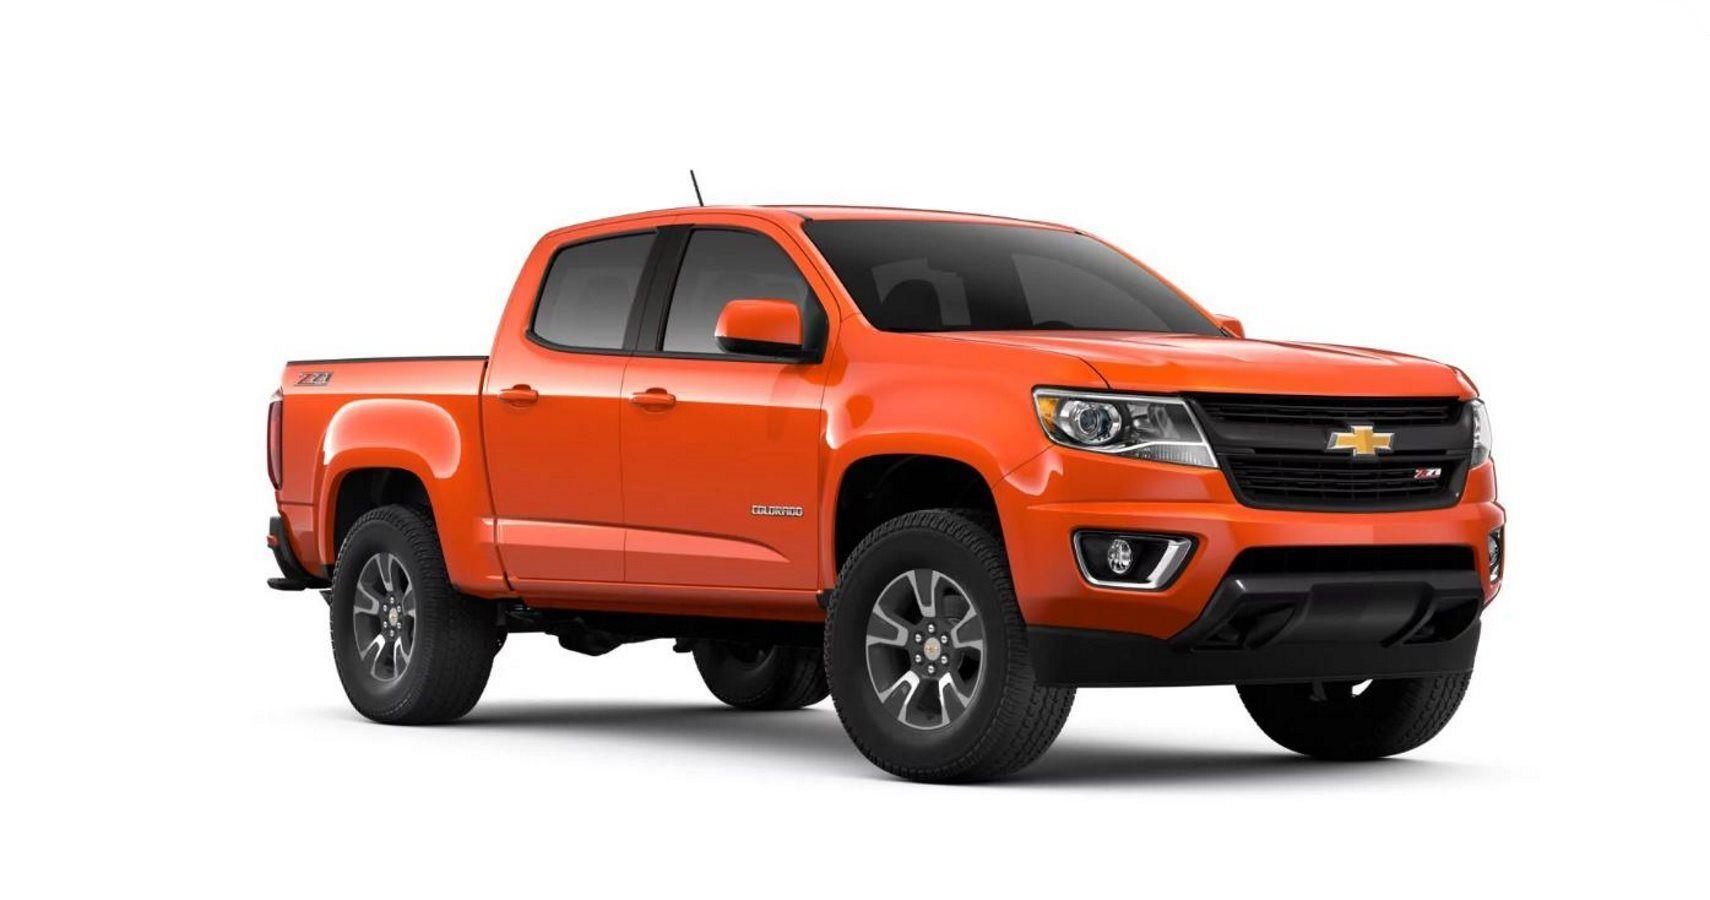 2019 Chevrolet Colorado Gets More Color Options | HotCars